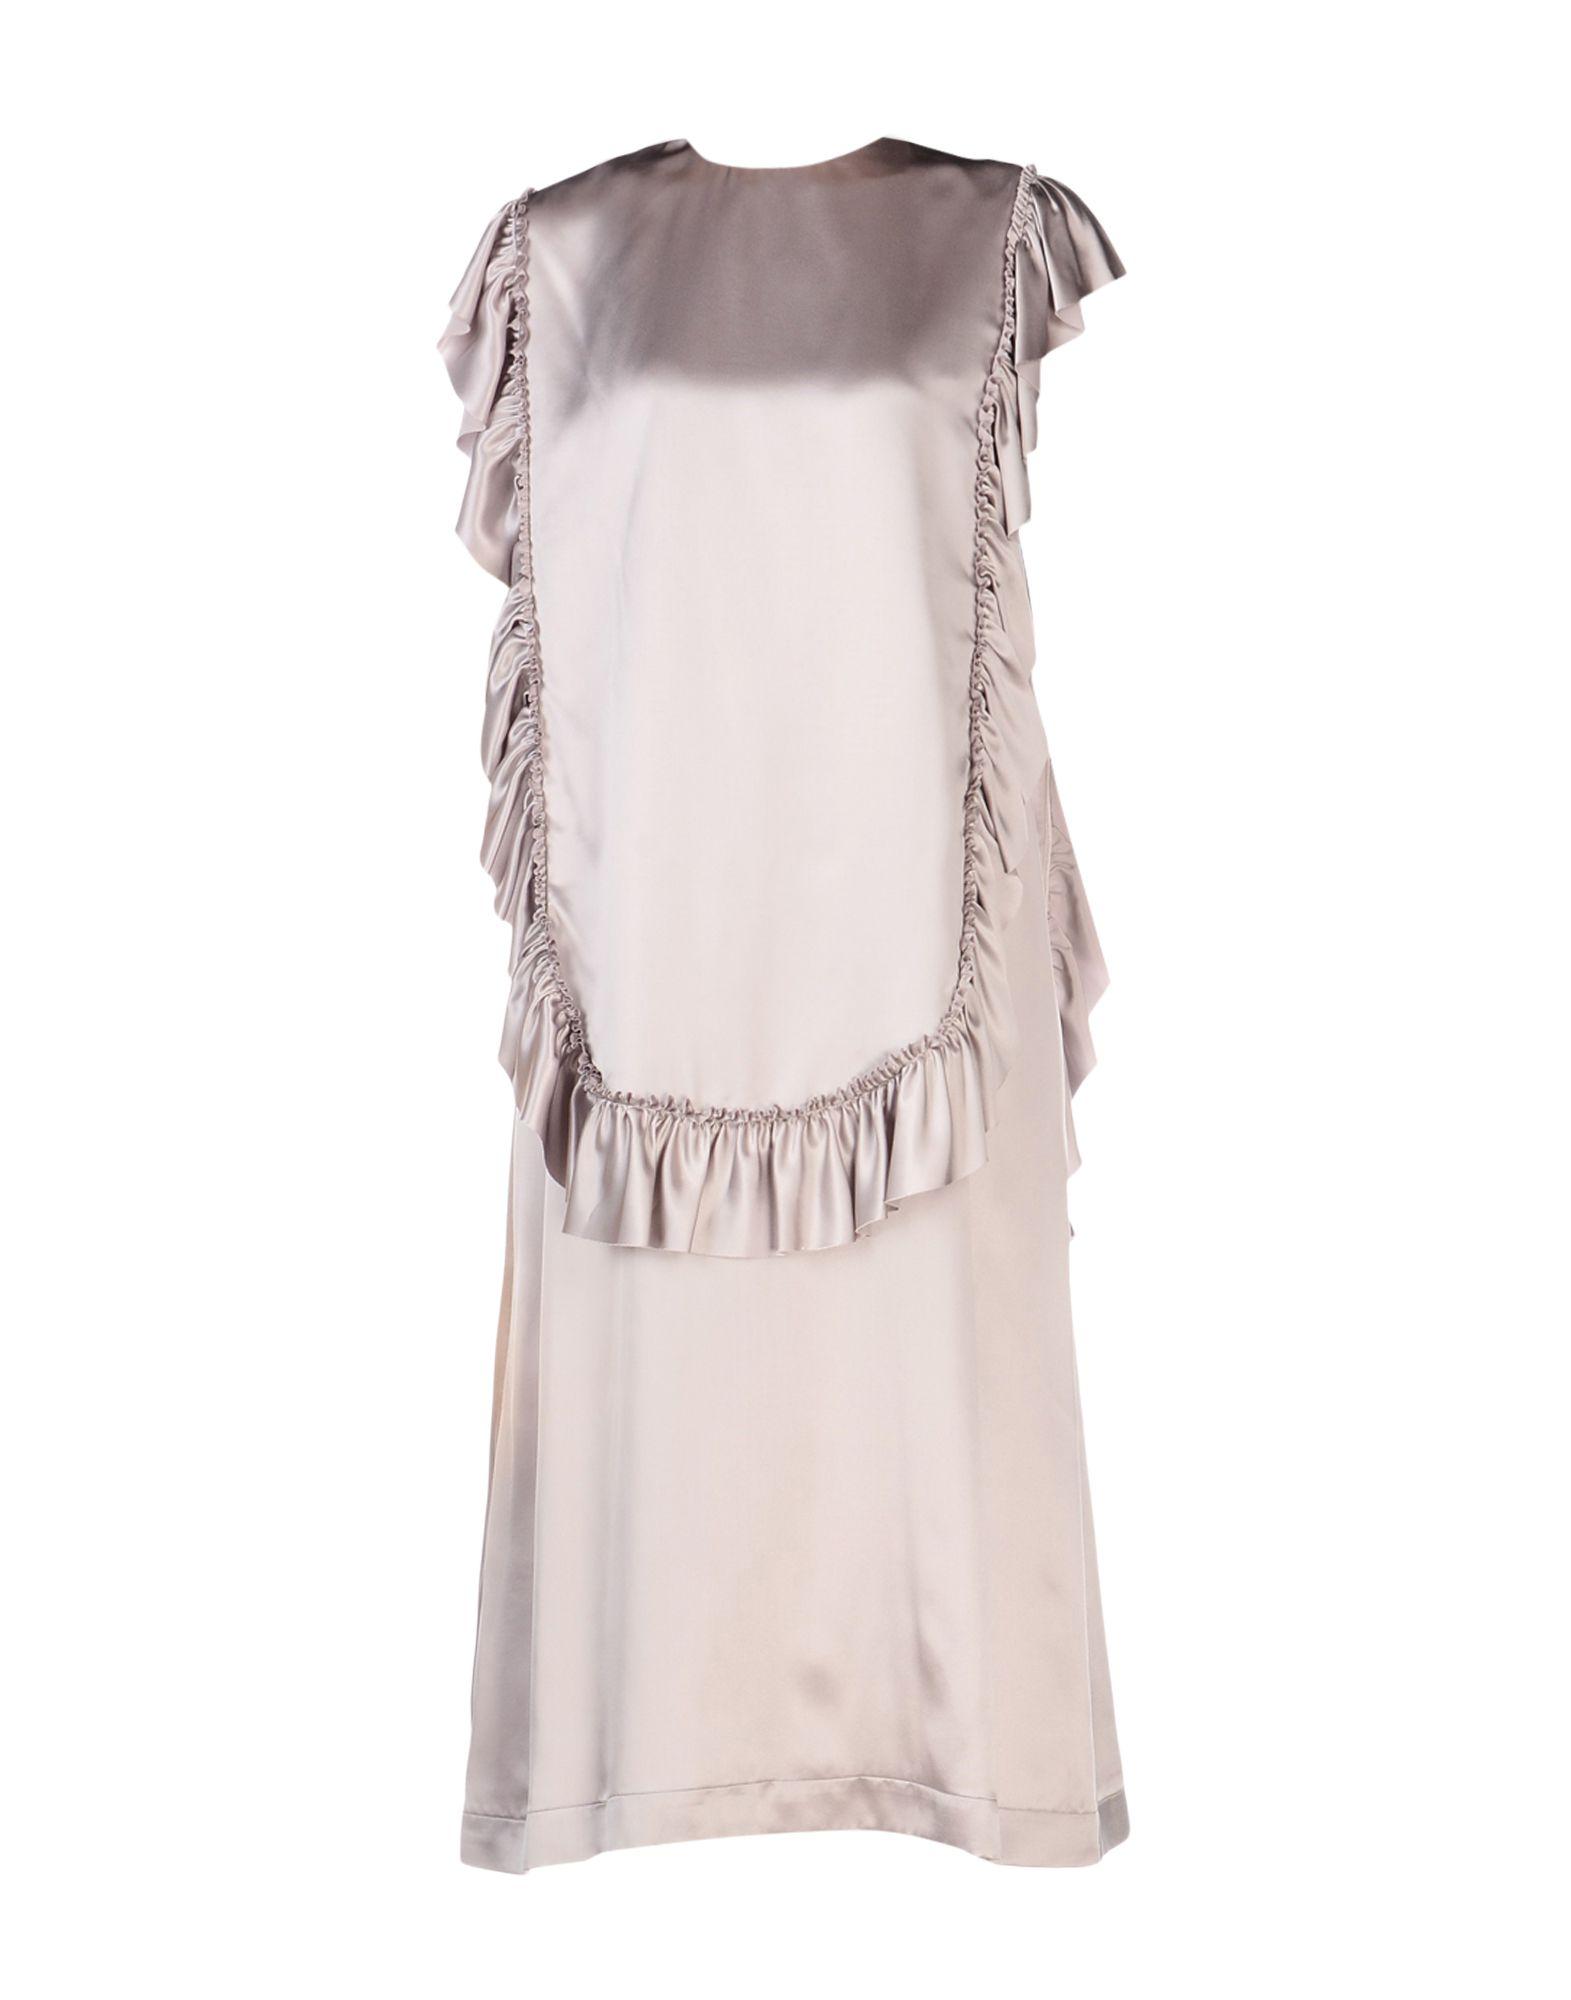 SIMONE ROCHA Платье длиной 3/4 tenax платье длиной 3 4